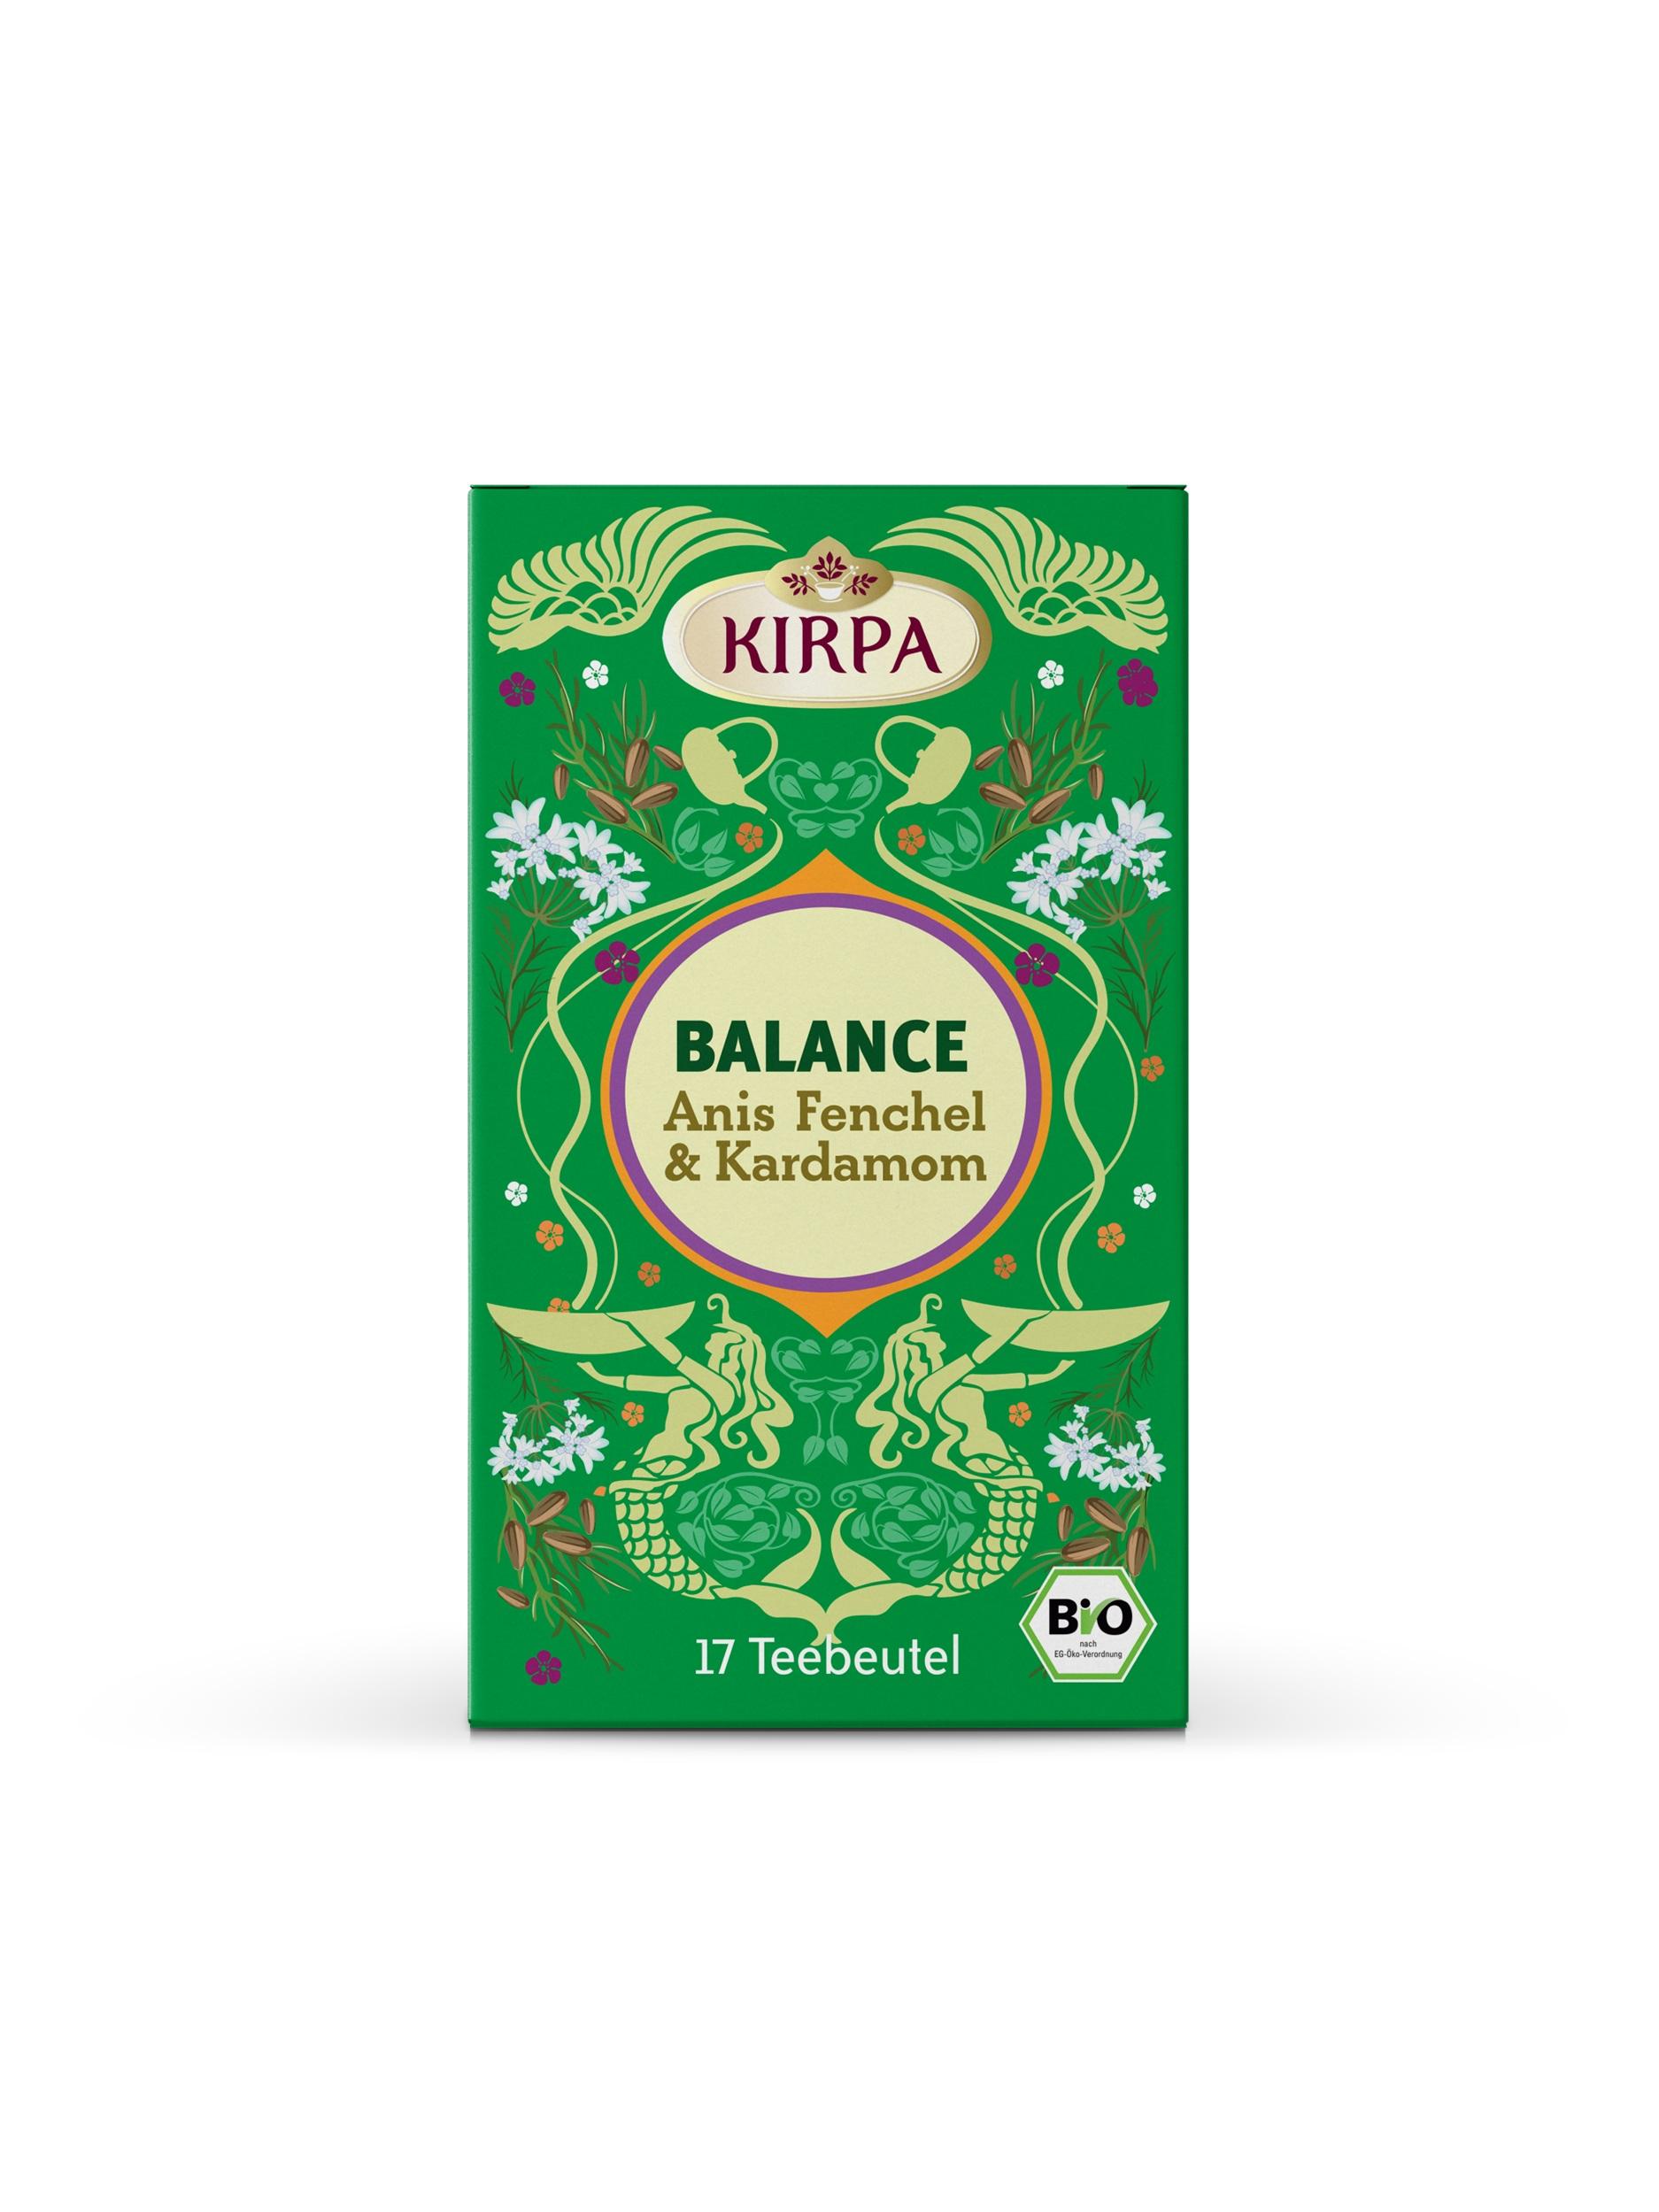 Kirpa_balance.jpg